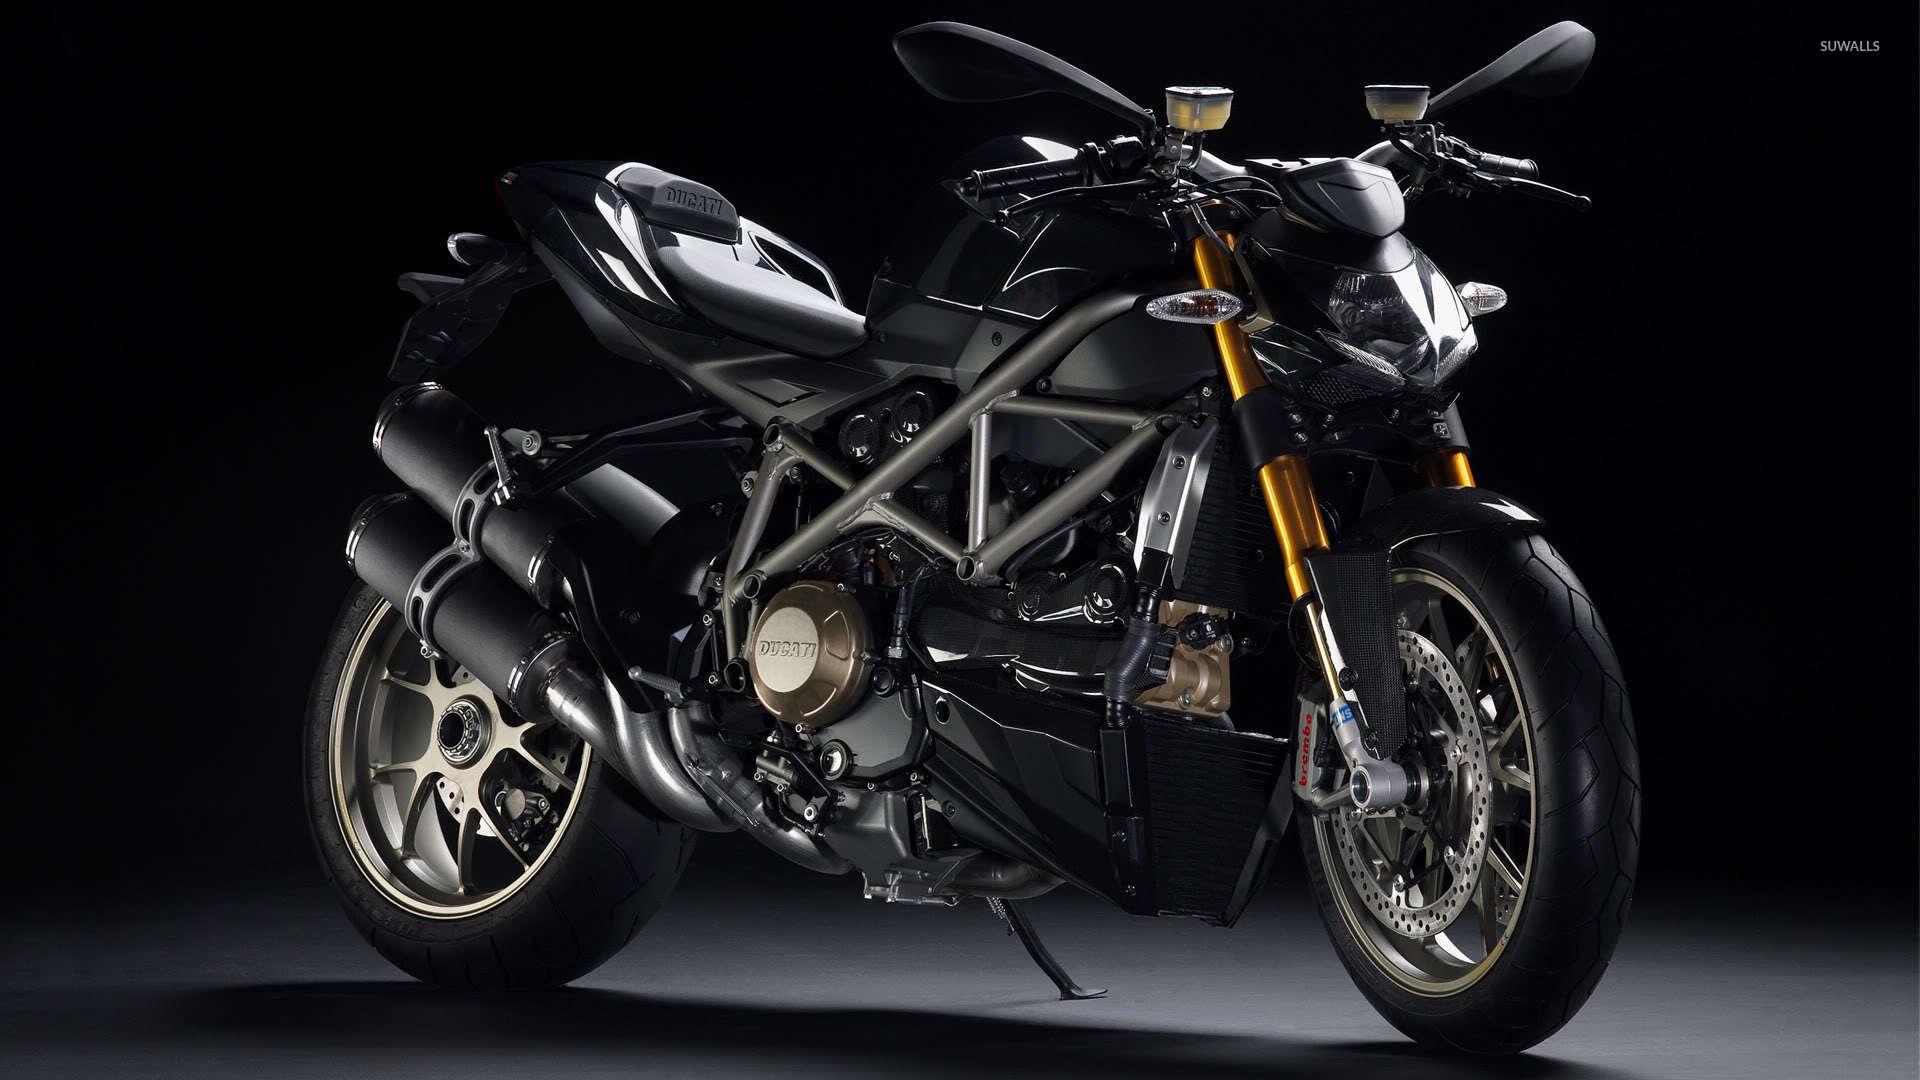 Ducati Streetfighter Wallpaper Motorcycle Wallpapers 2485